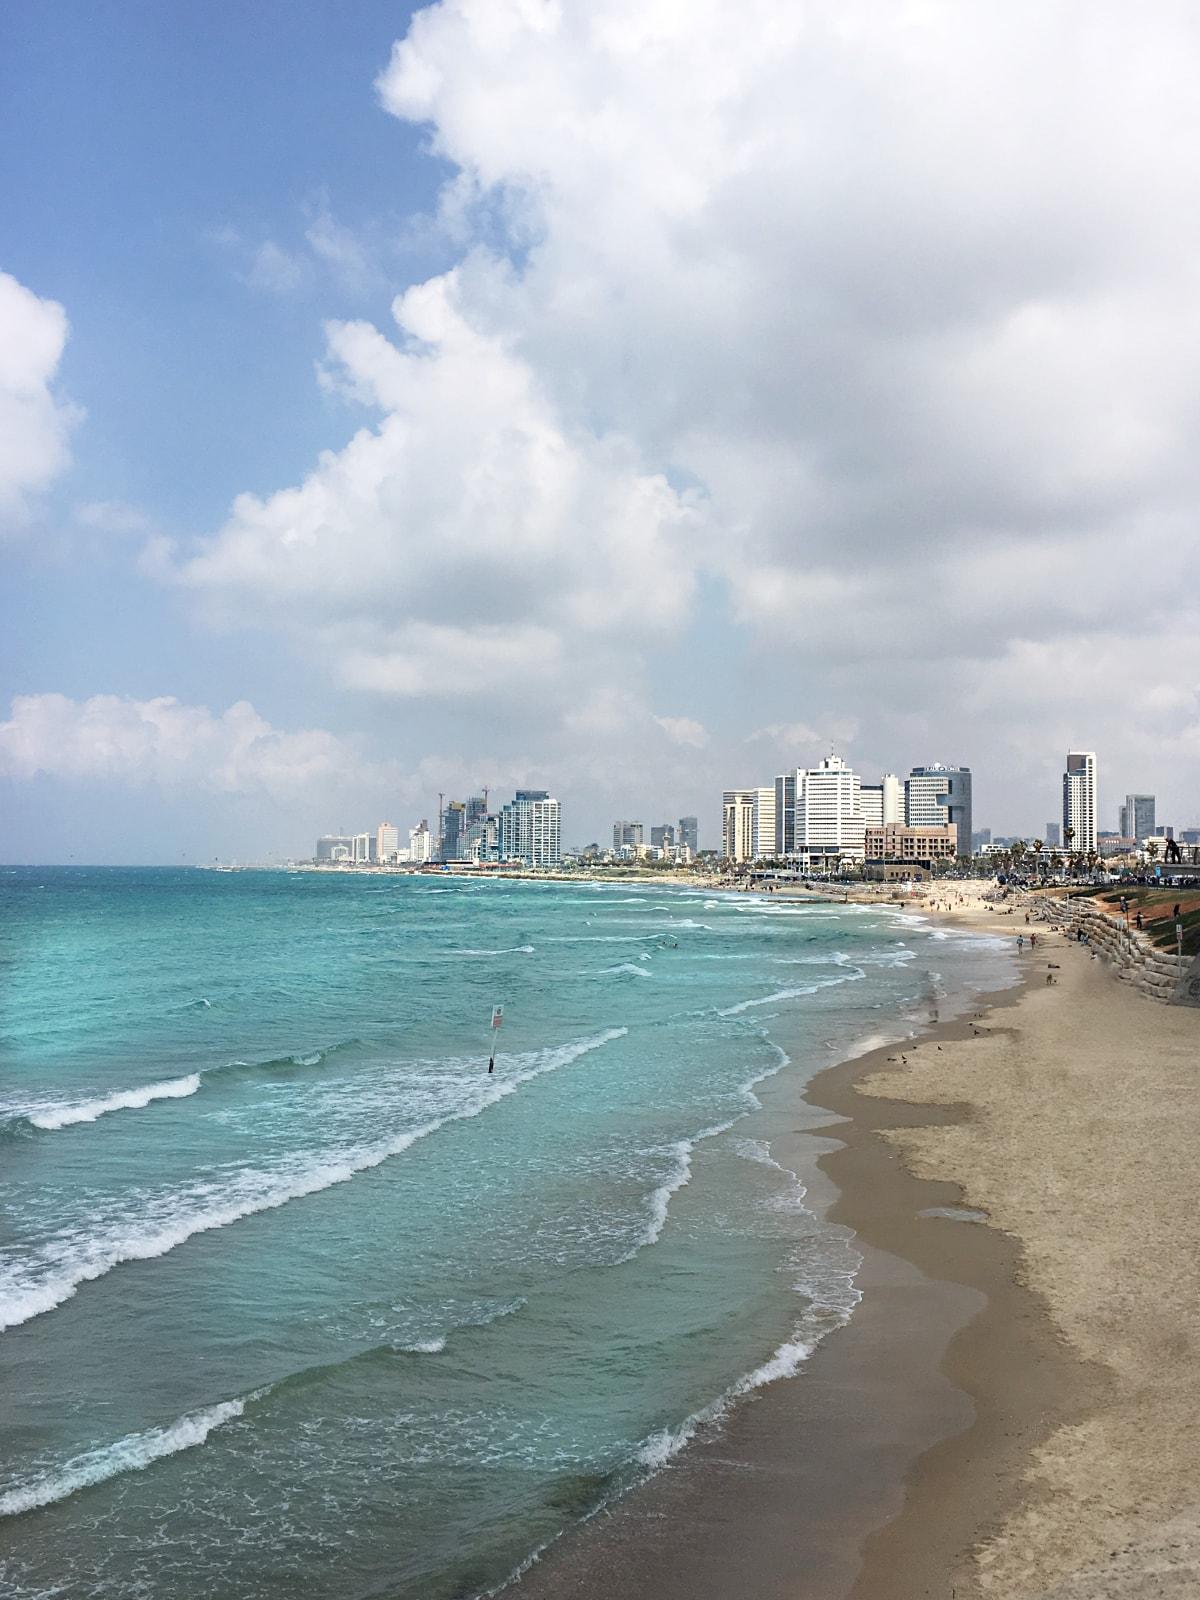 TRAVEL DIARY: Tel Aviv, Israel